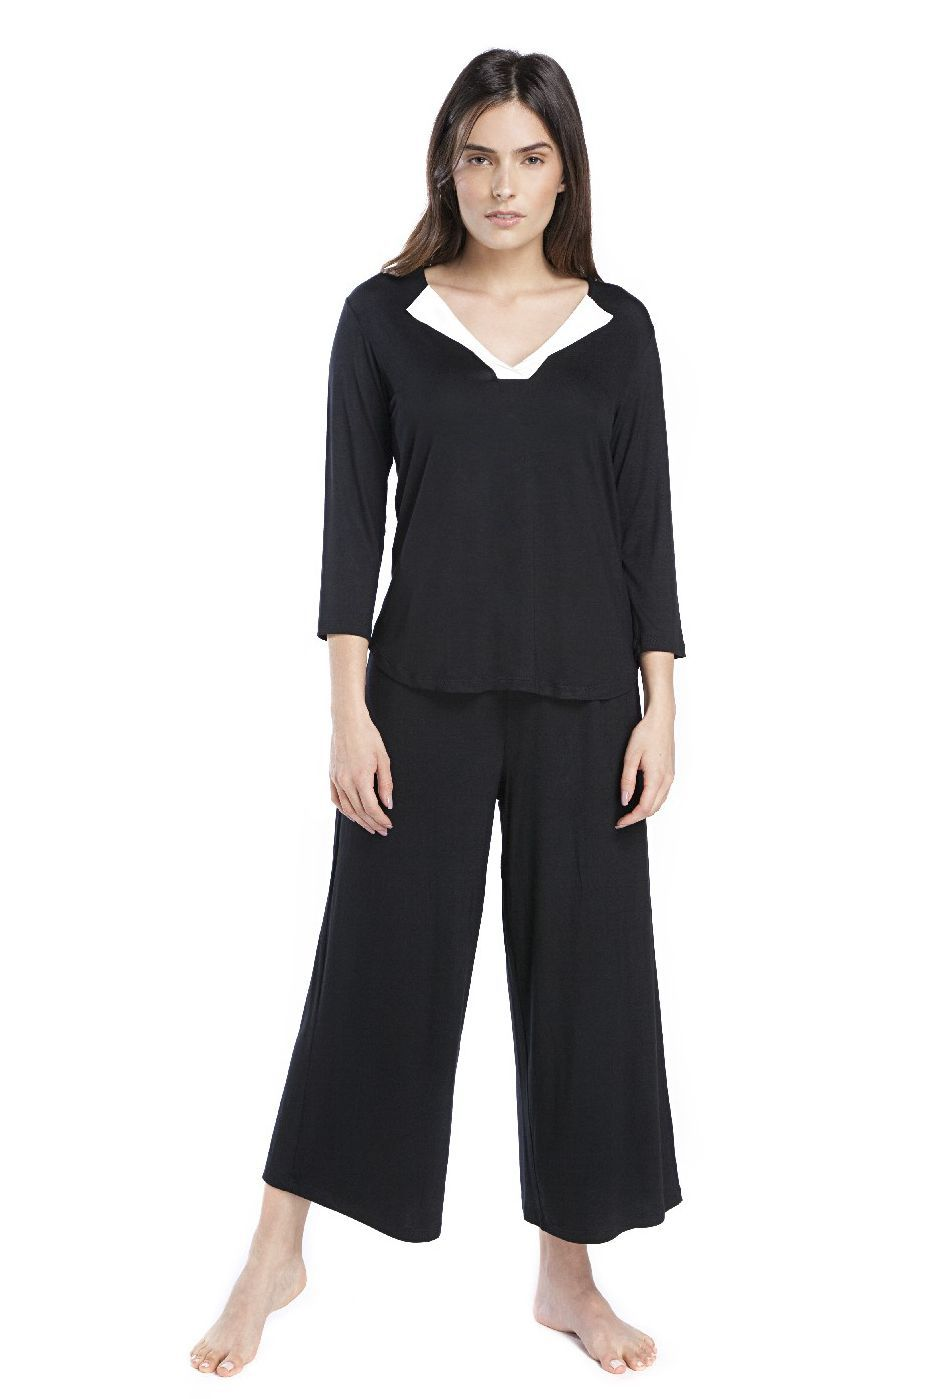 Pijama Pantacourt Feminino Preto